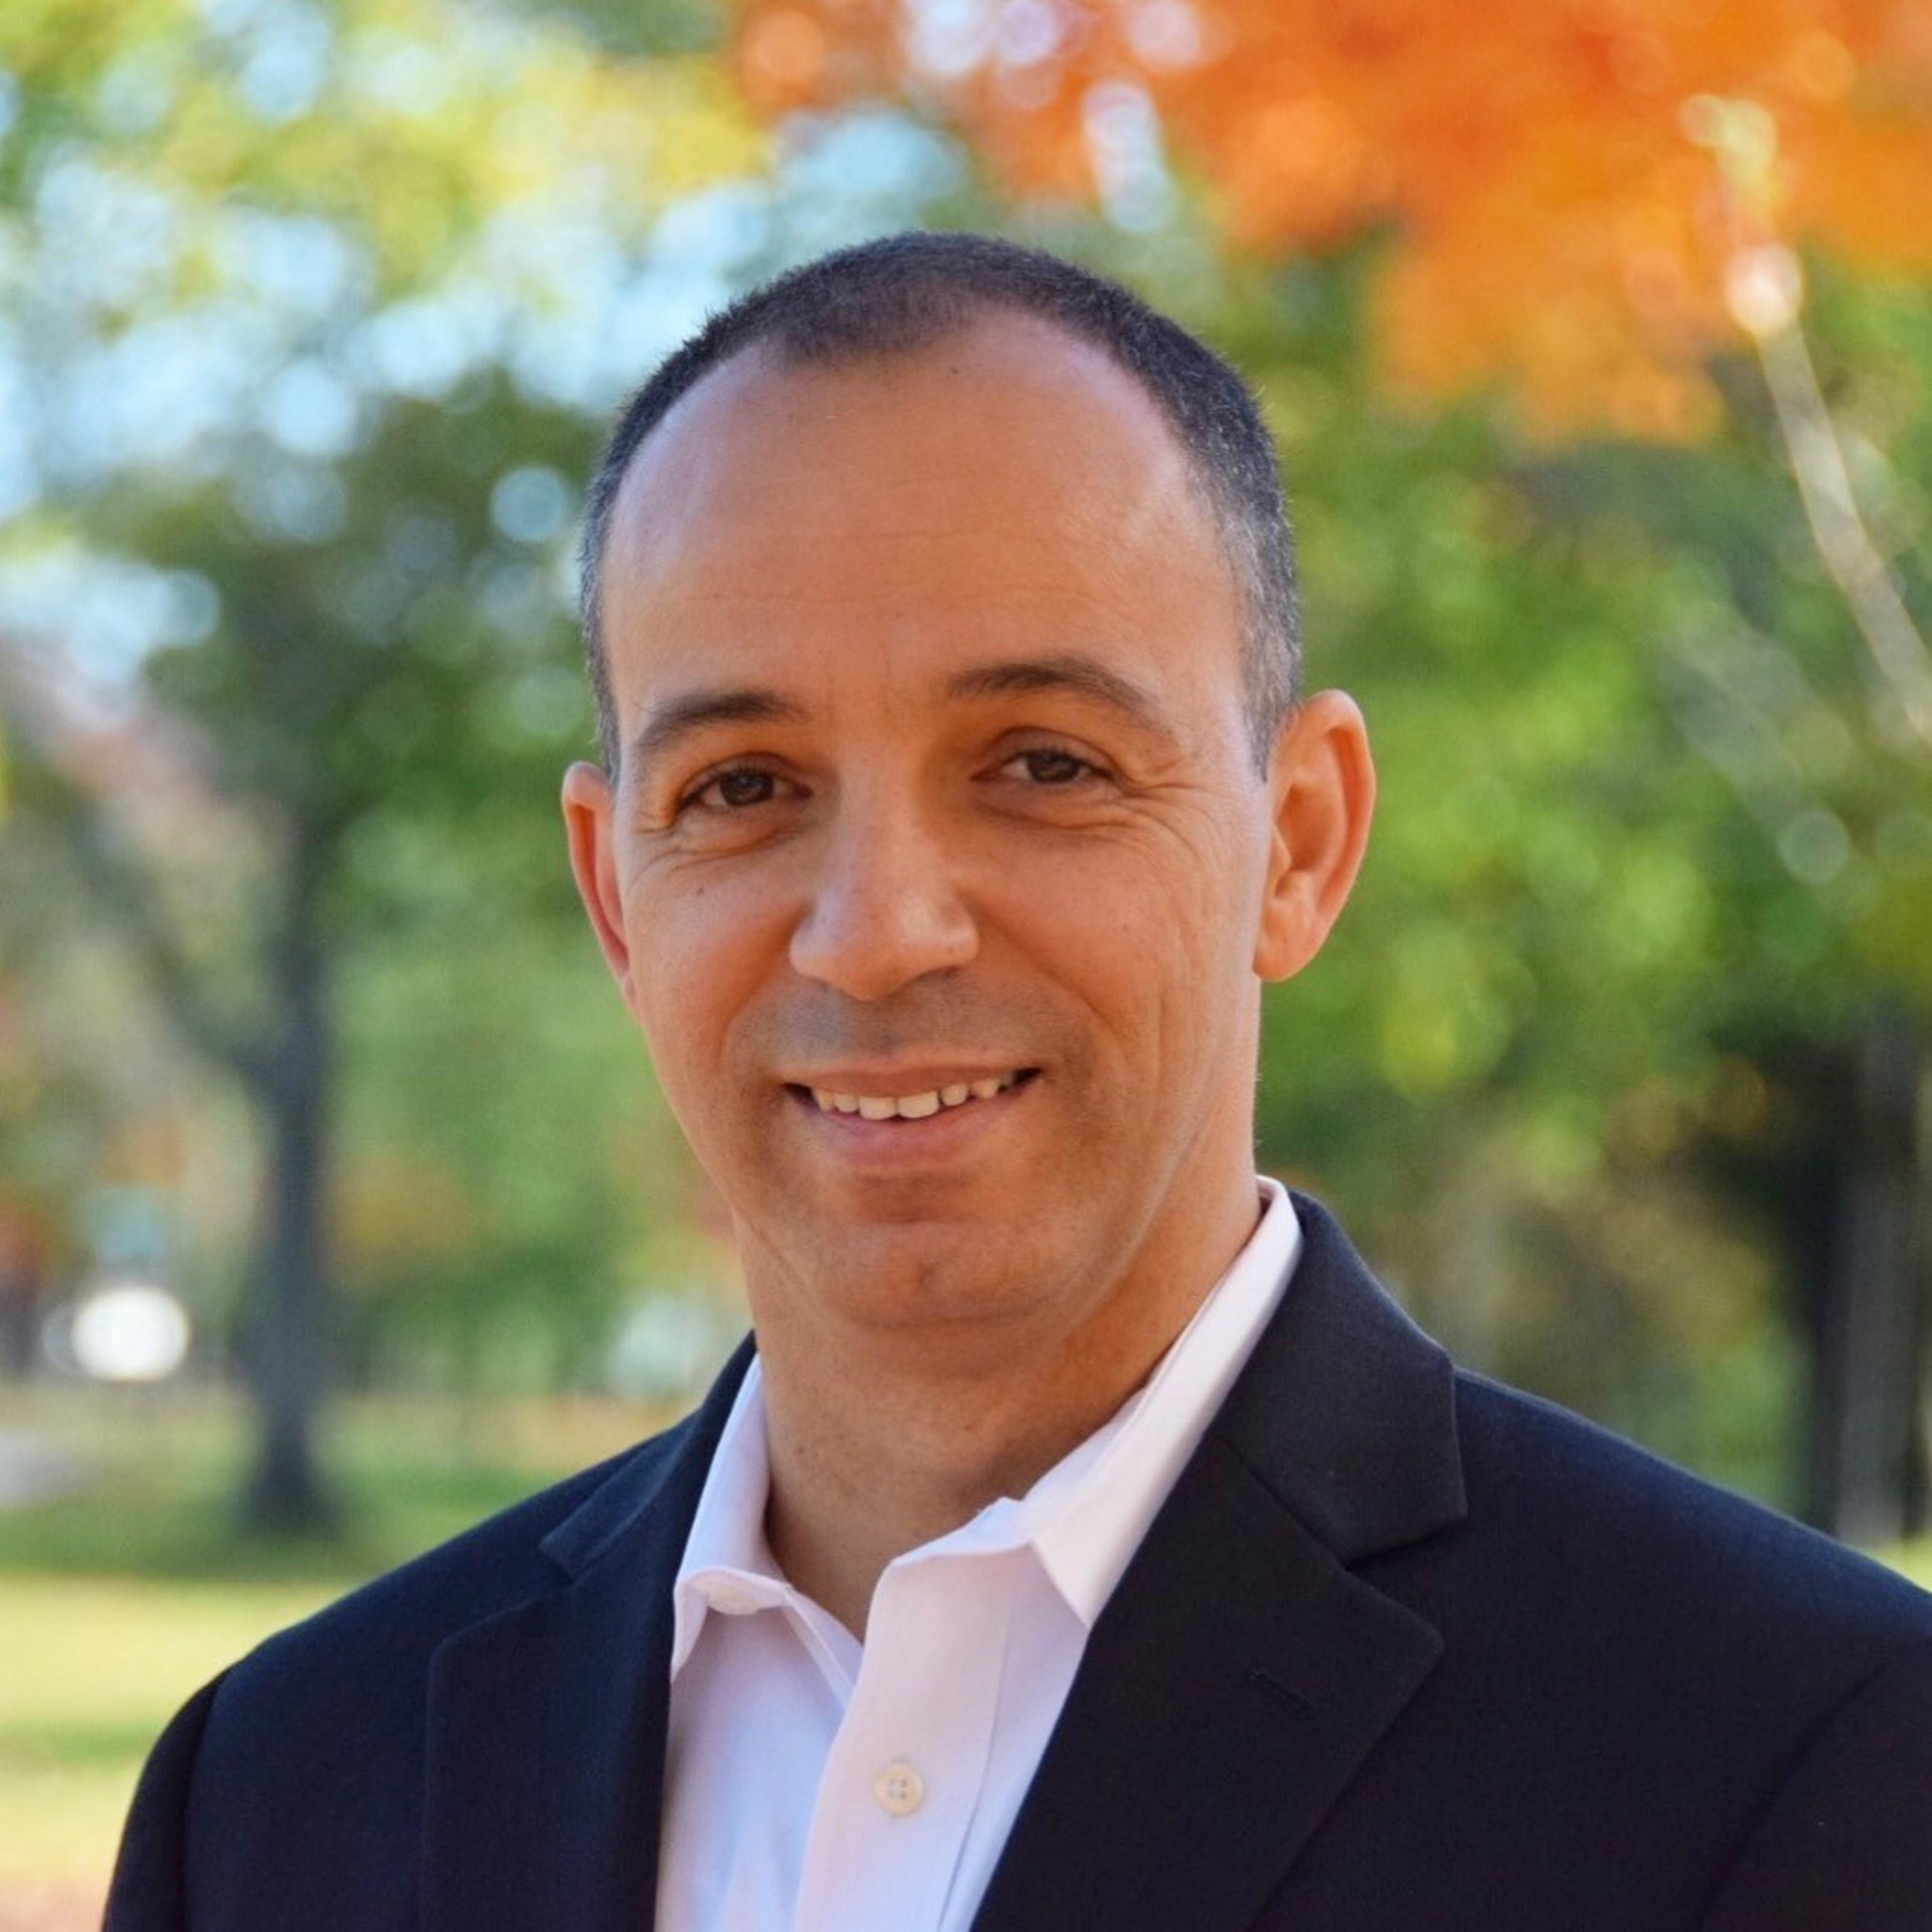 Eyal Levin, Zuznow Advisory Board Member and IBM Sales Leader